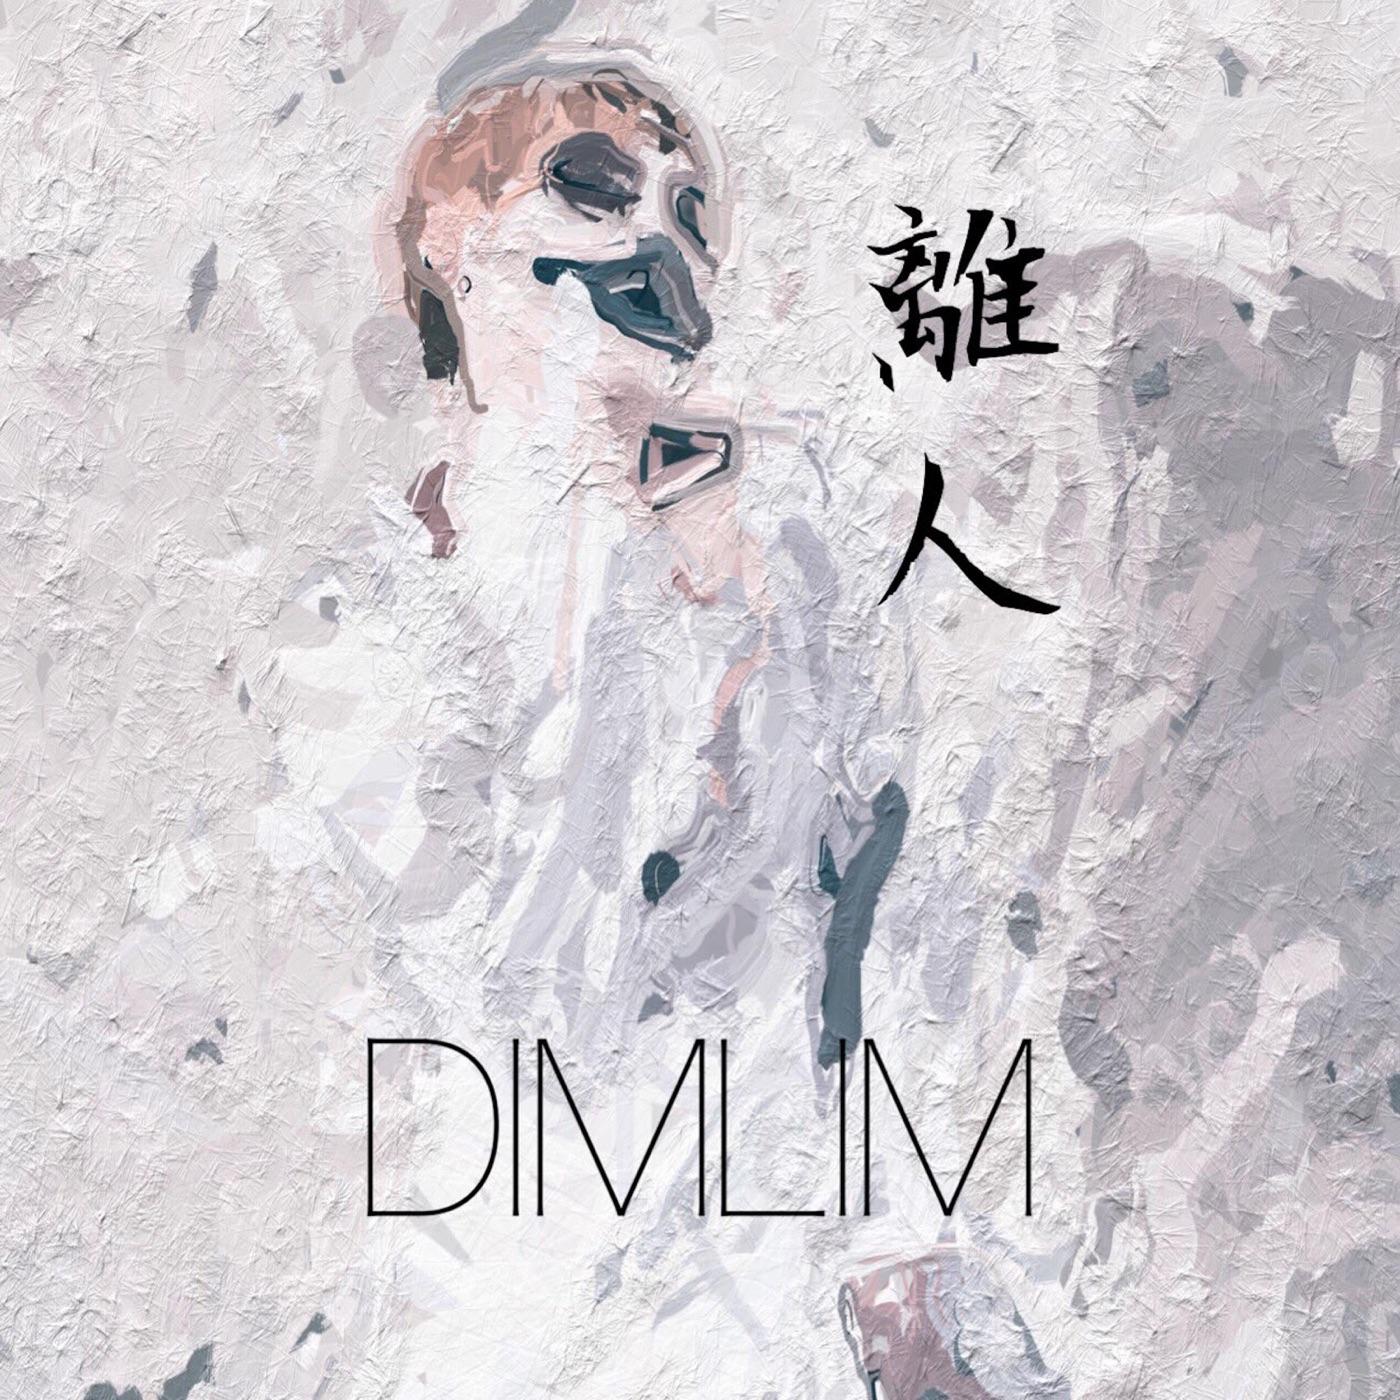 DIMLIM - 離人 [Single] (2019)